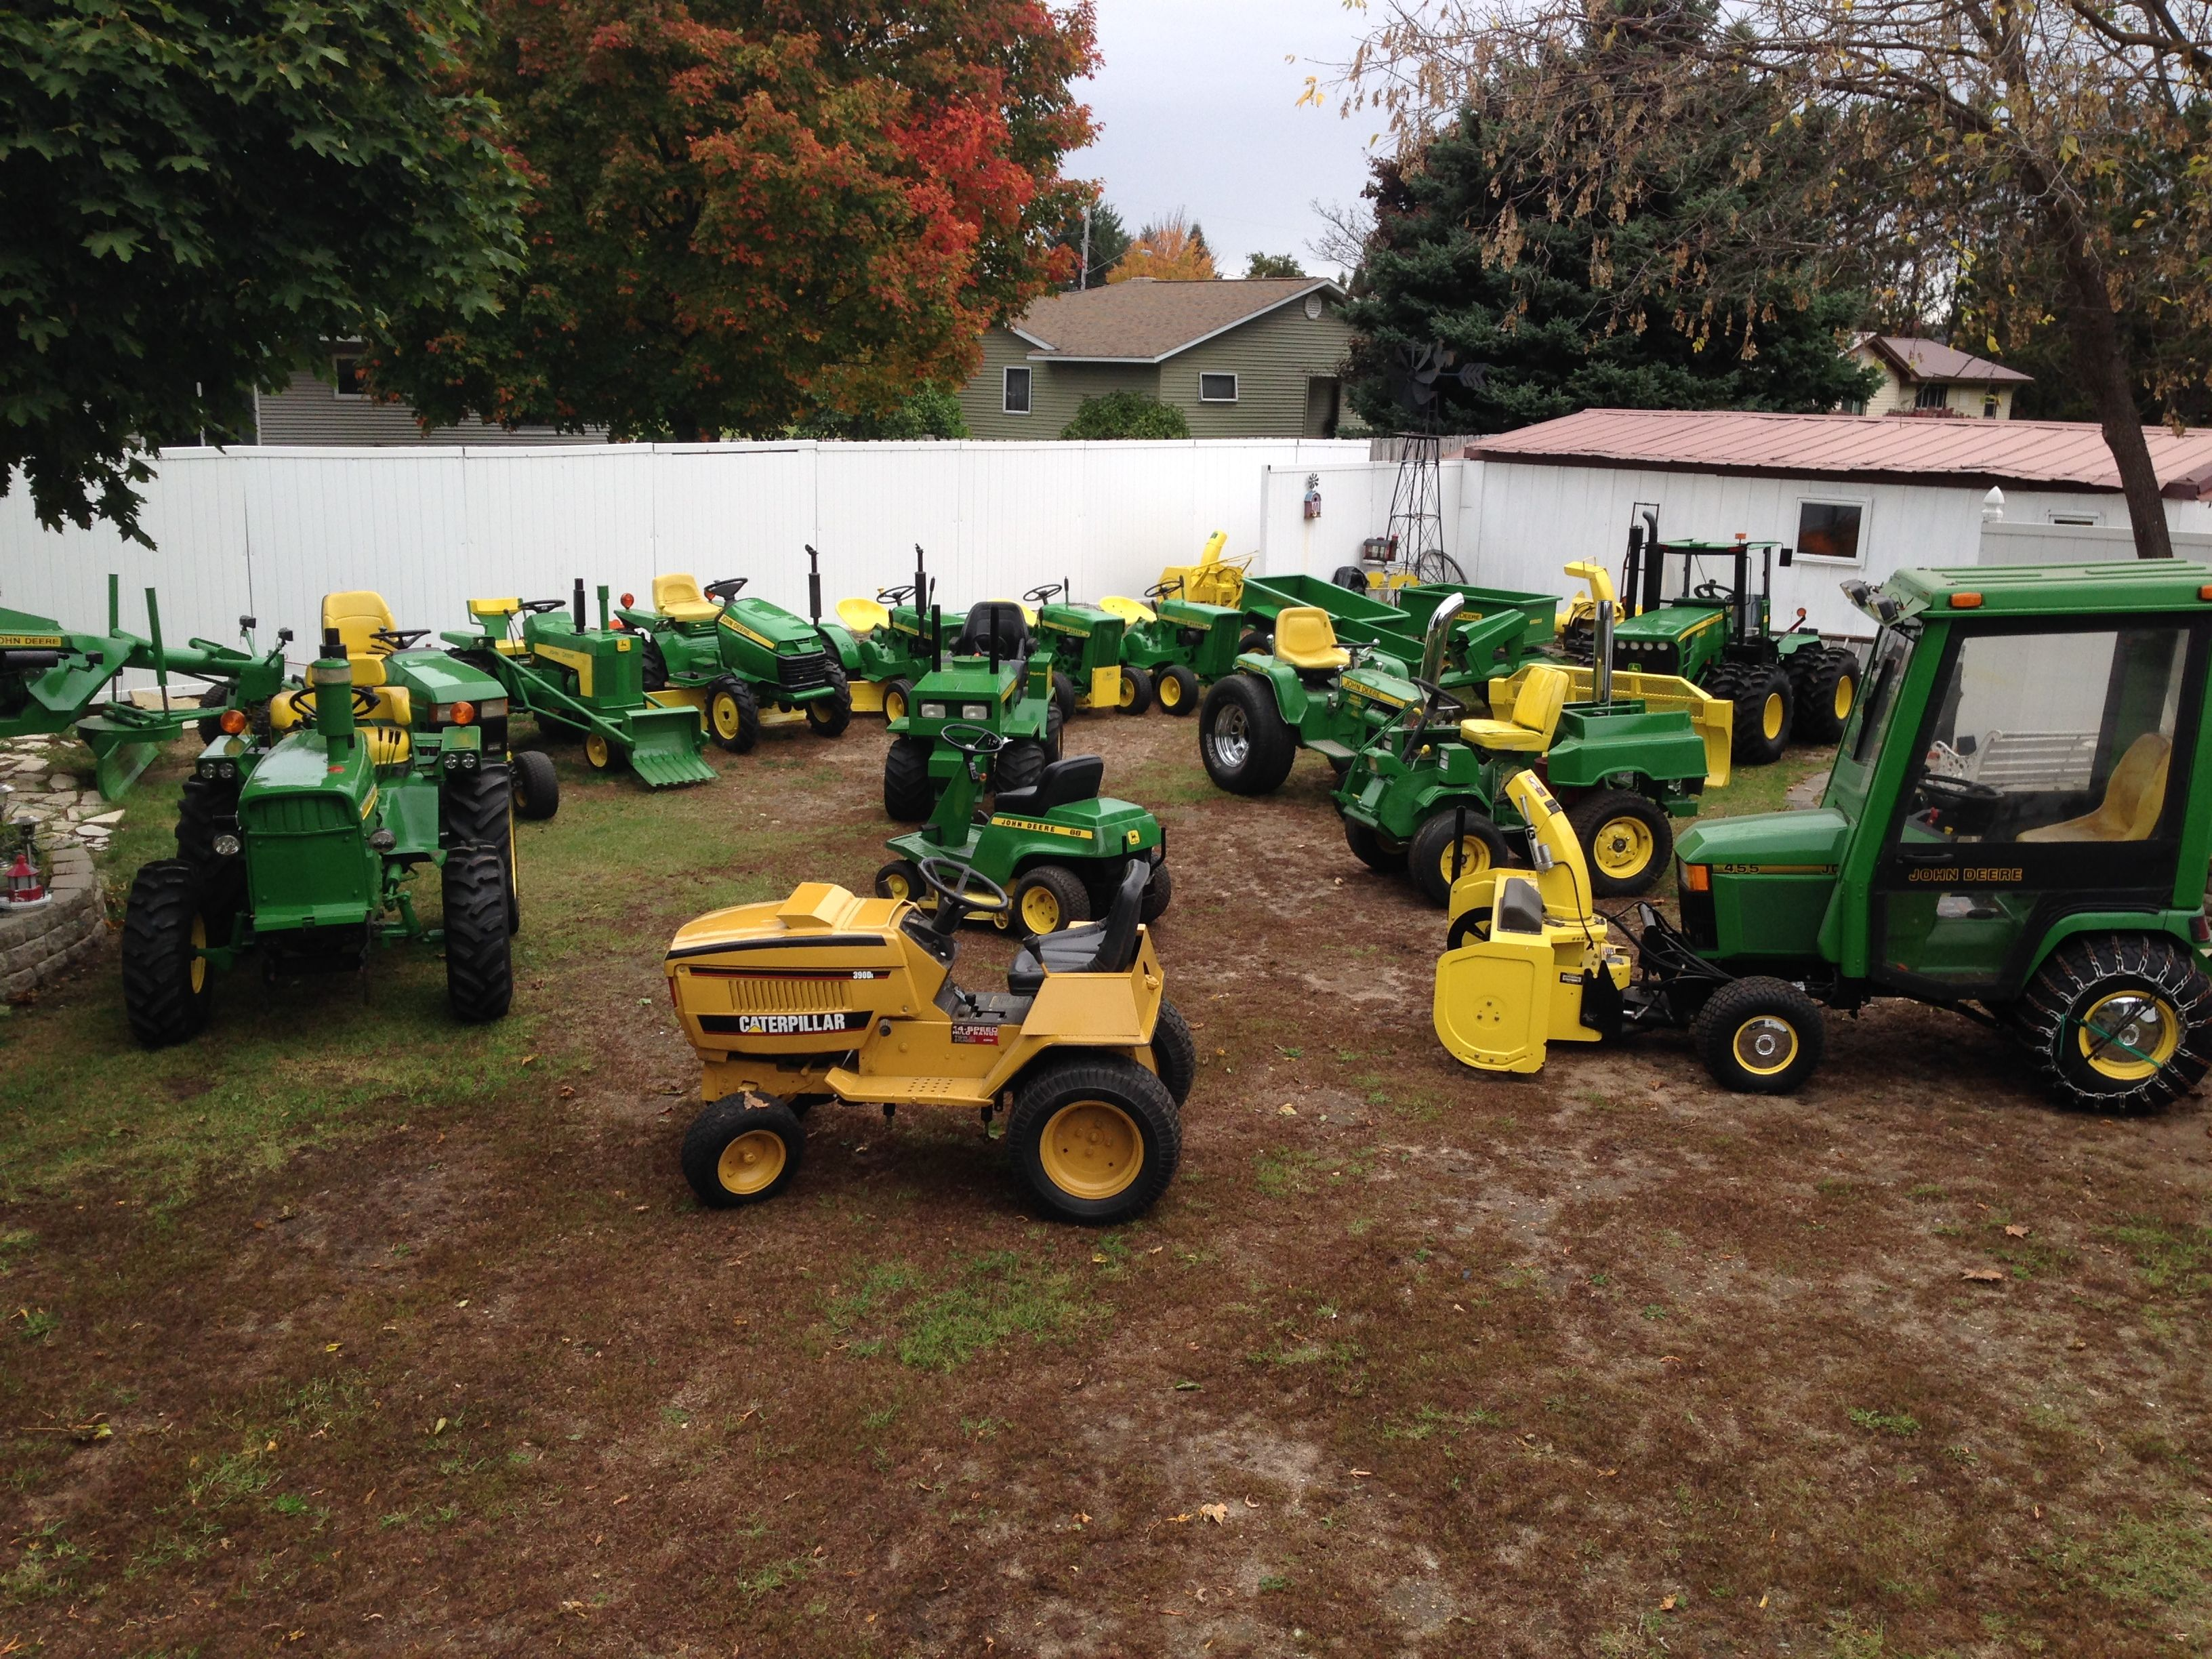 Several of my custom garden tractors in my backyard | The Little ...